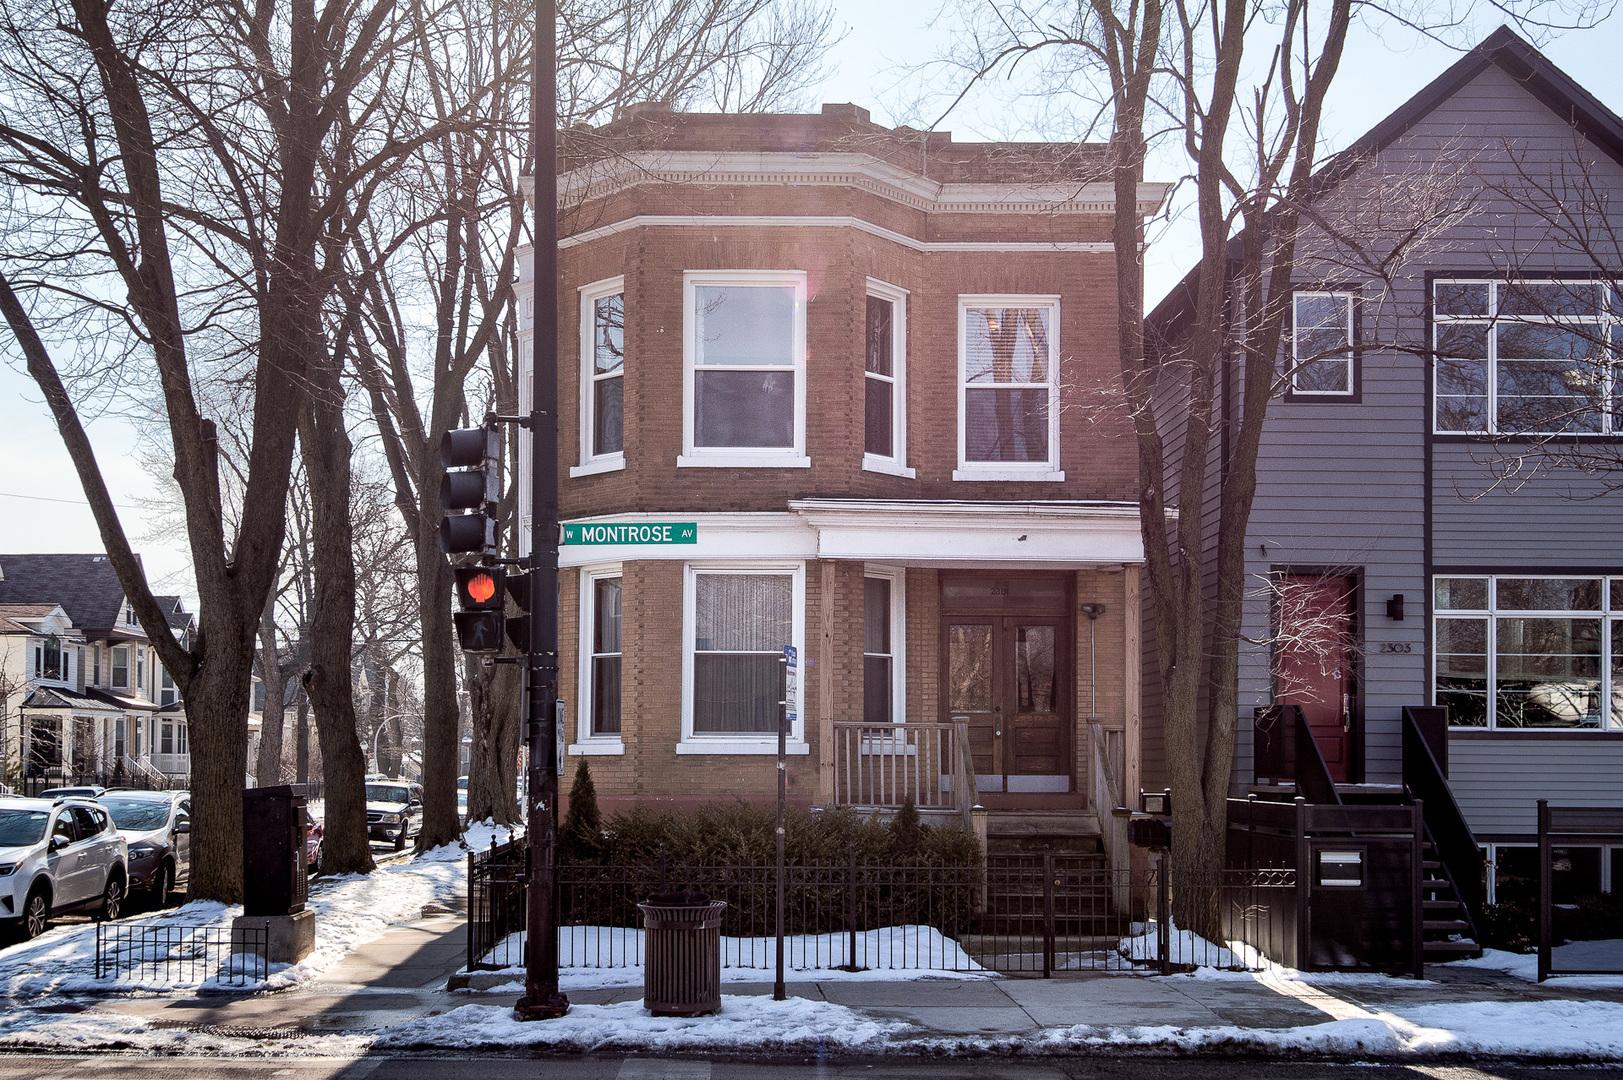 2301 West MONTROSE, CHICAGO, Illinois, 60618